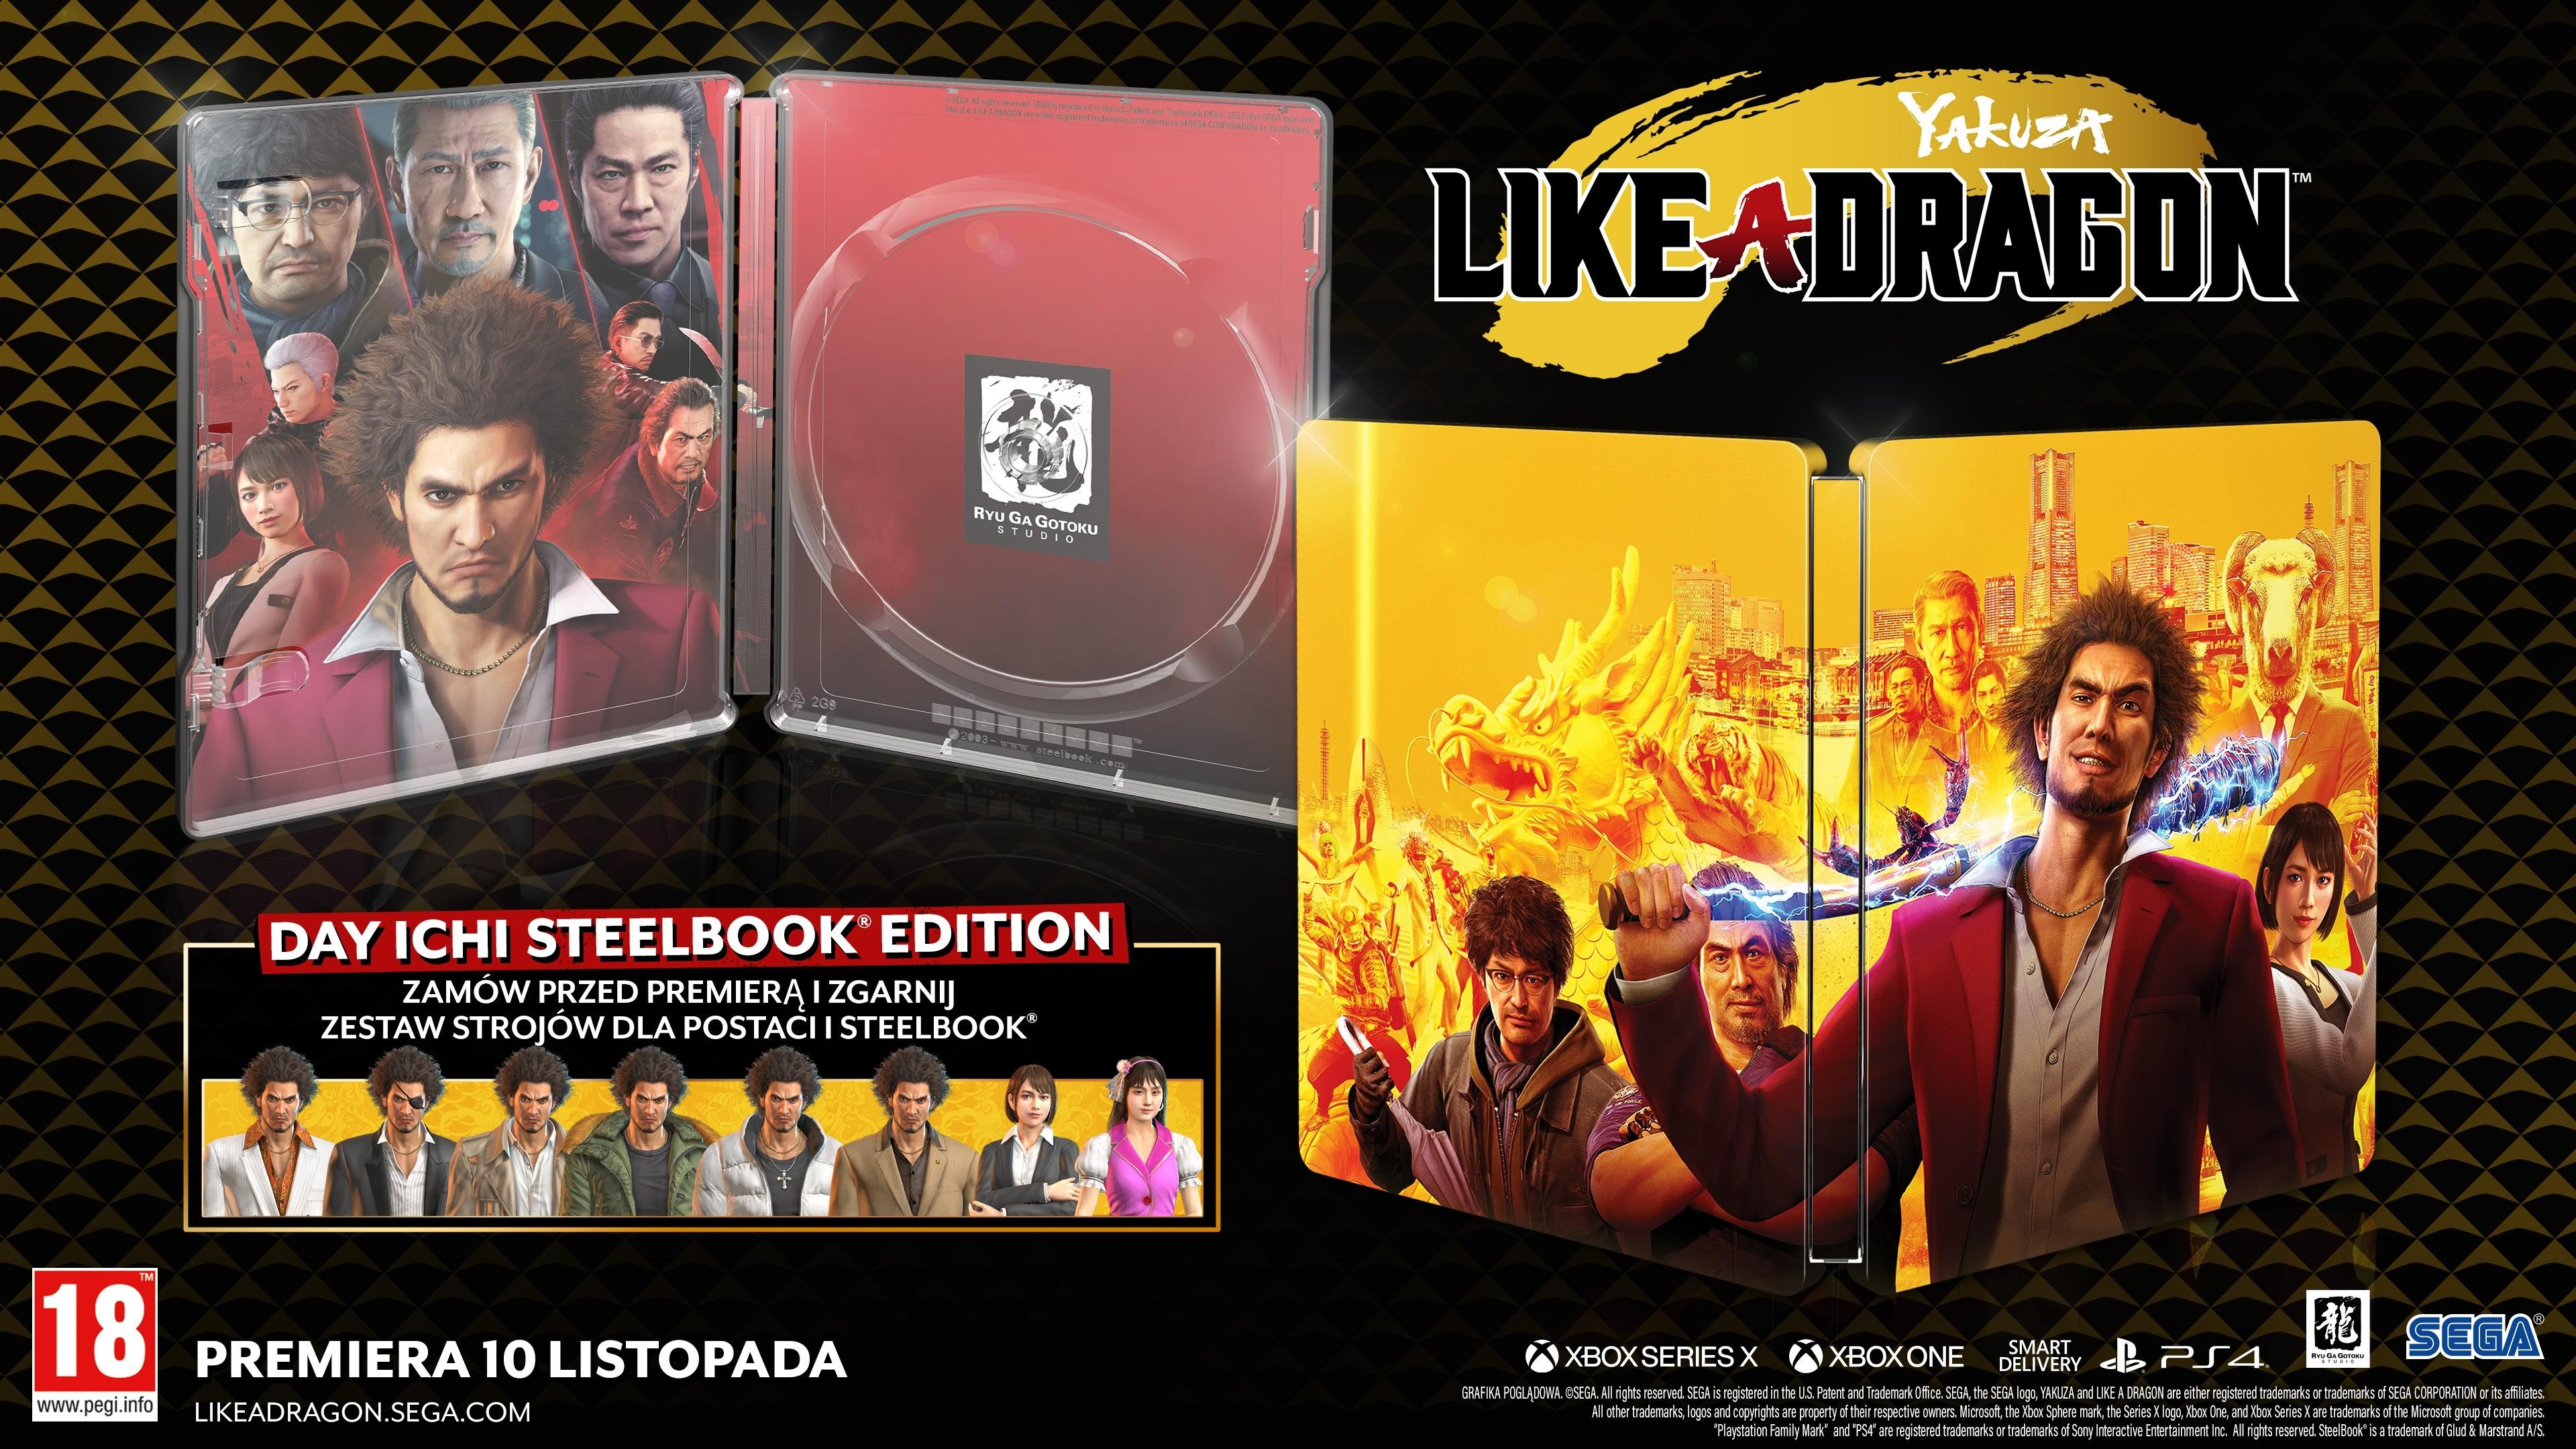 Yakuza Like A Dragon Day Ichi Steelbook Edition